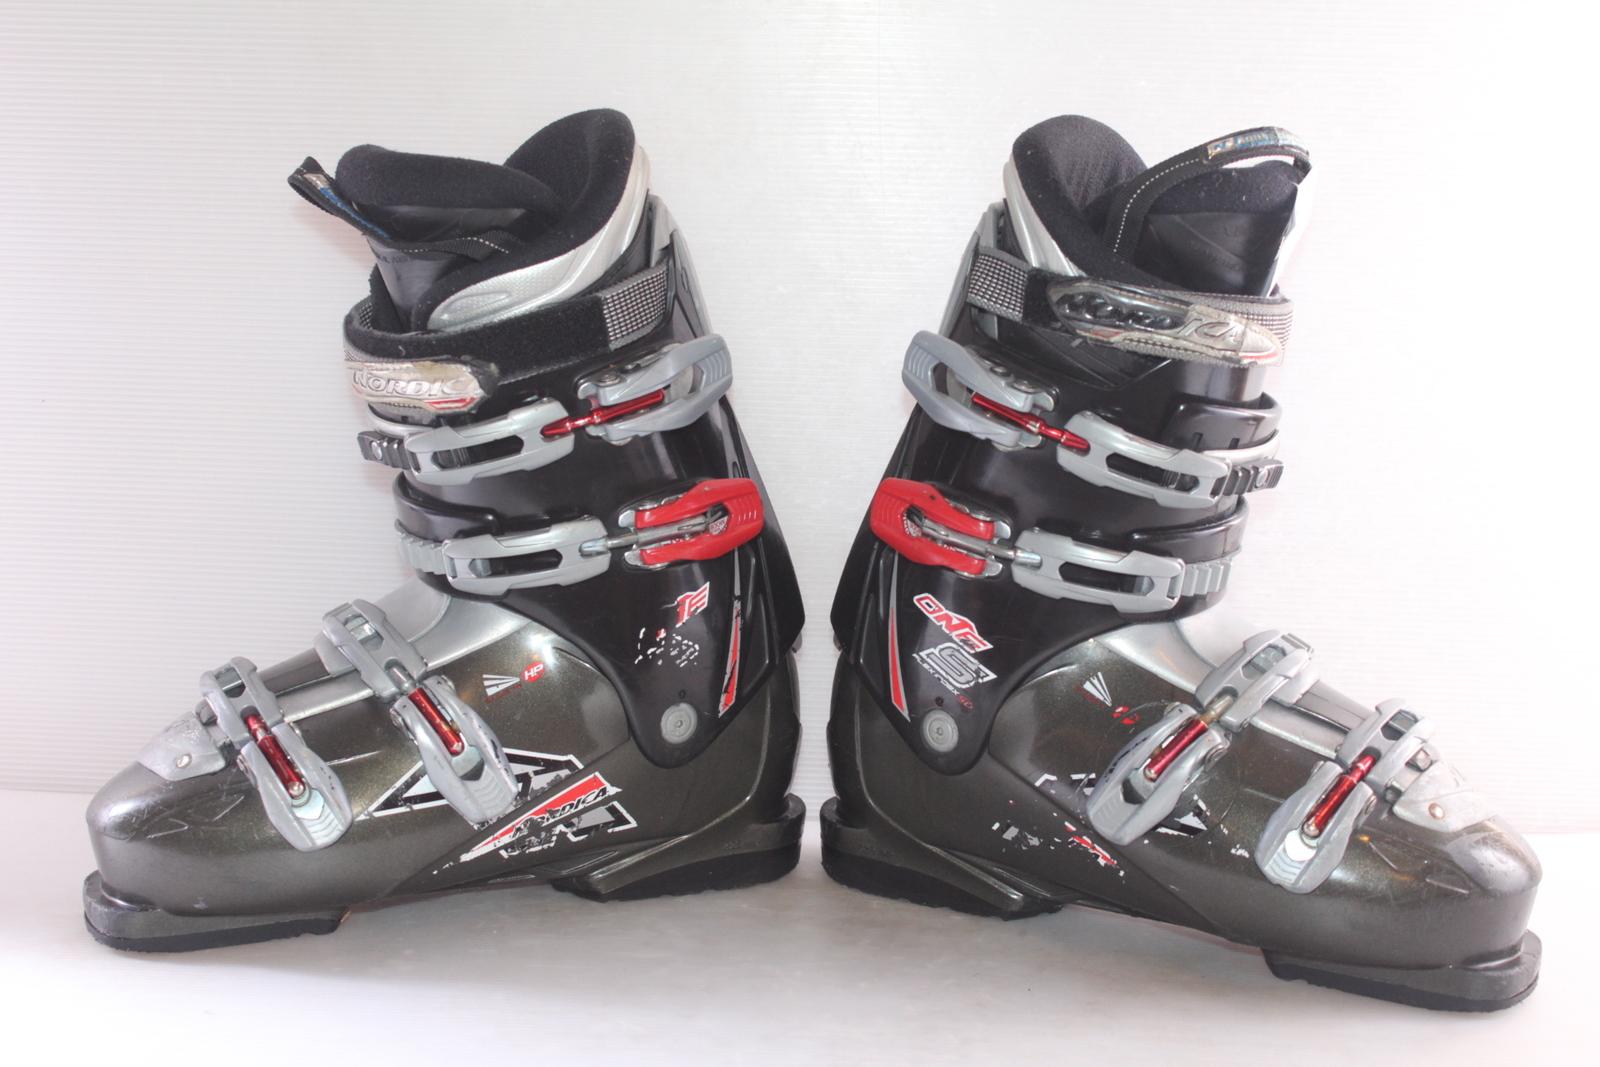 Lyžařské boty Nordica ONE S vel. EU43.5 flexe 50